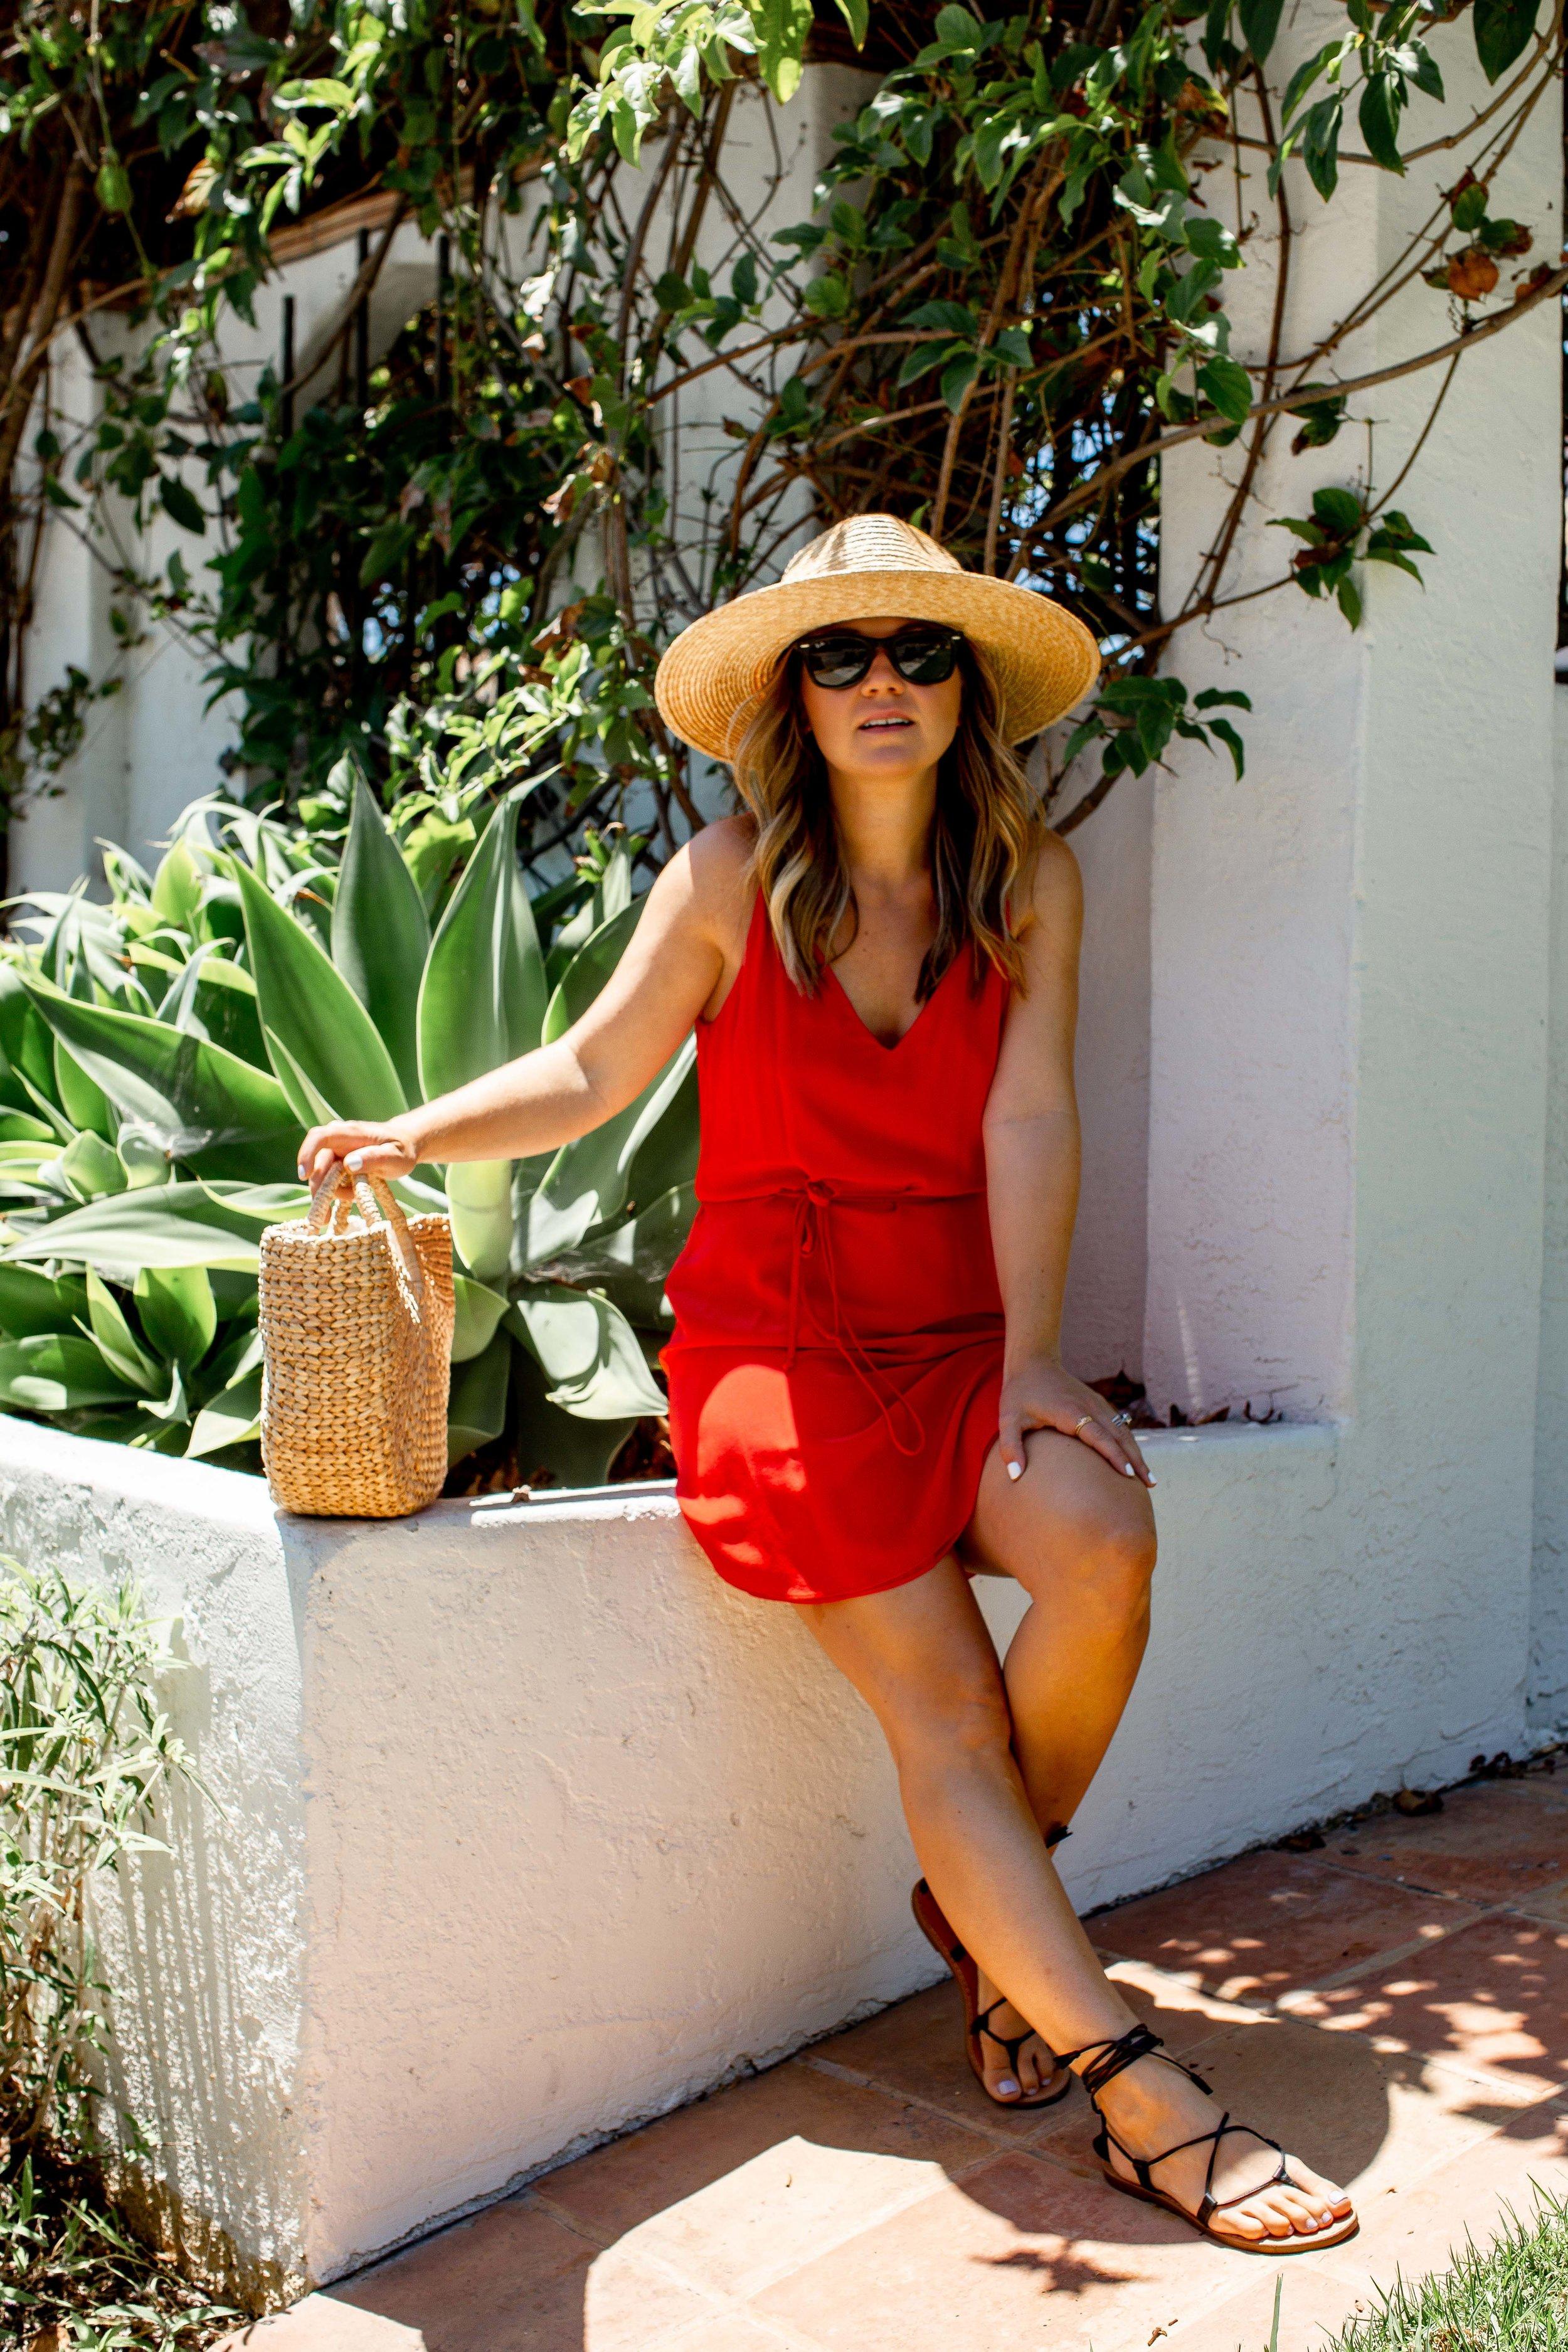 fizz-fade-red-cami-dress-6.jpg